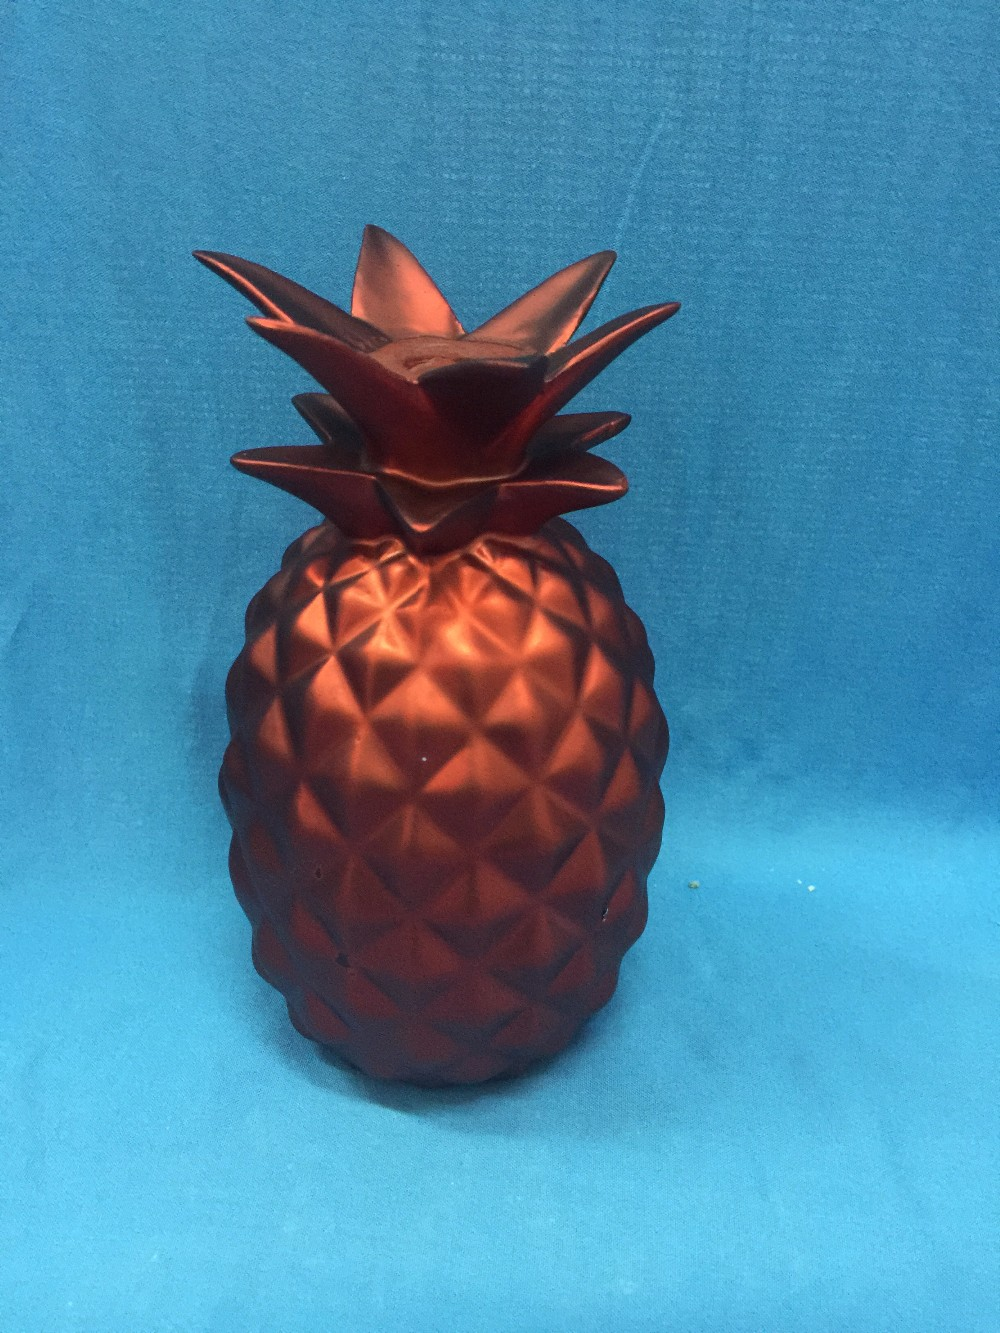 Oem ceramic wholesale artificial fruit pineapple christmas for Artificial pineapple decoration fruit